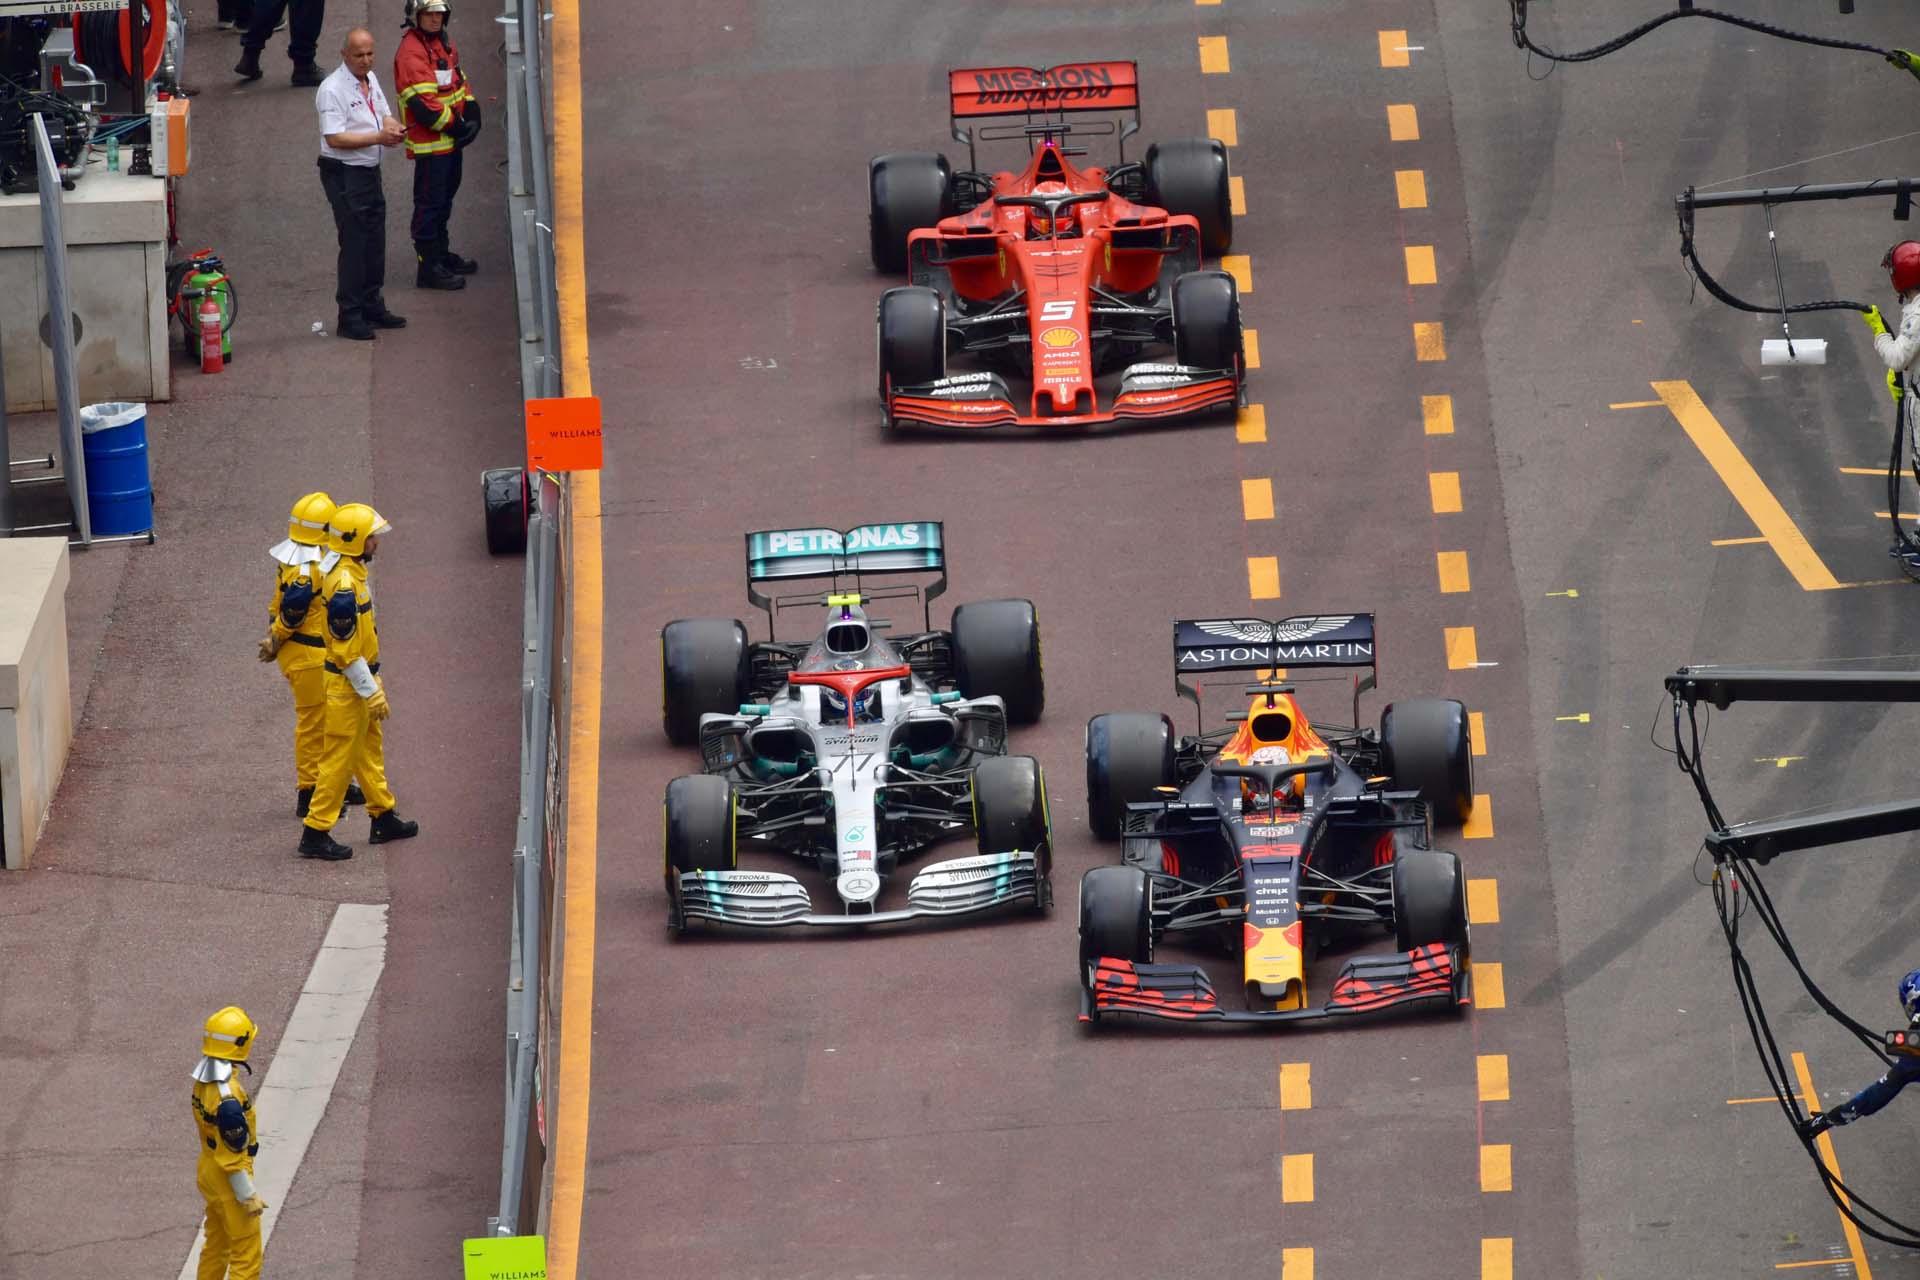 MonacoGP2019_SUN_Pirelli_monacosunday22-276123